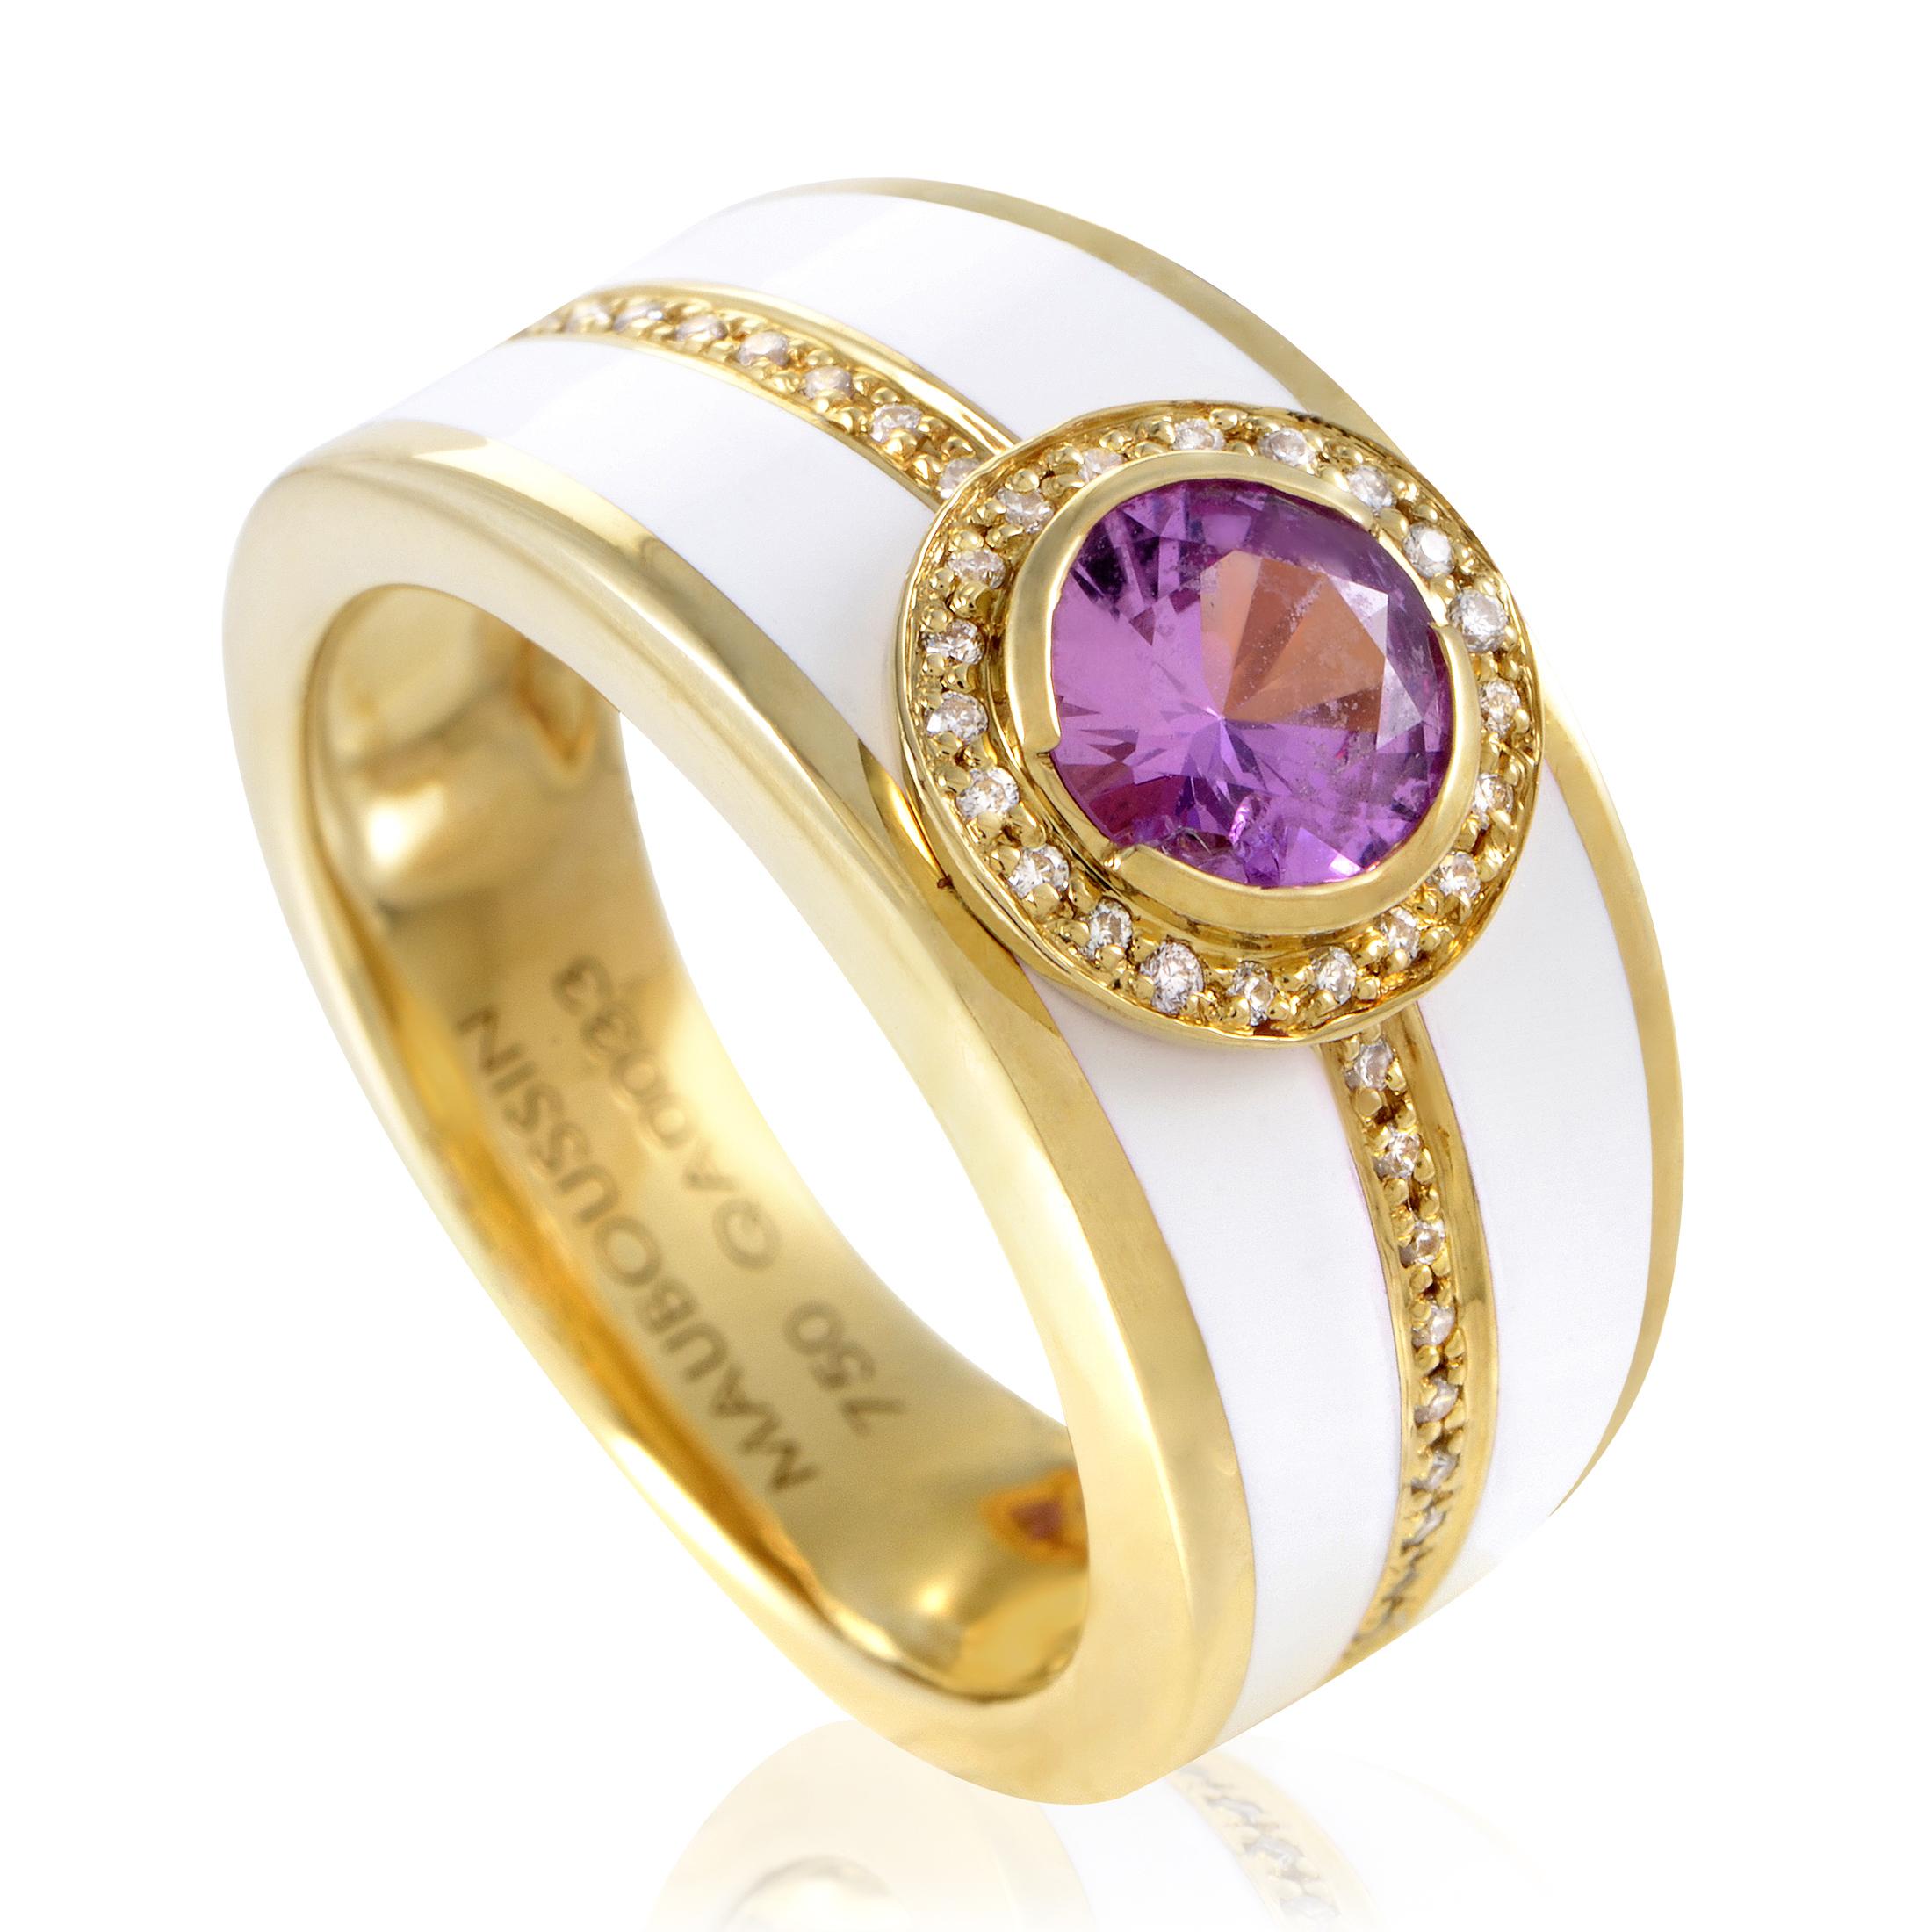 Mauboussin Women's Enameled 18K Yellow Gold Diamond & Tourmaline Band Ring